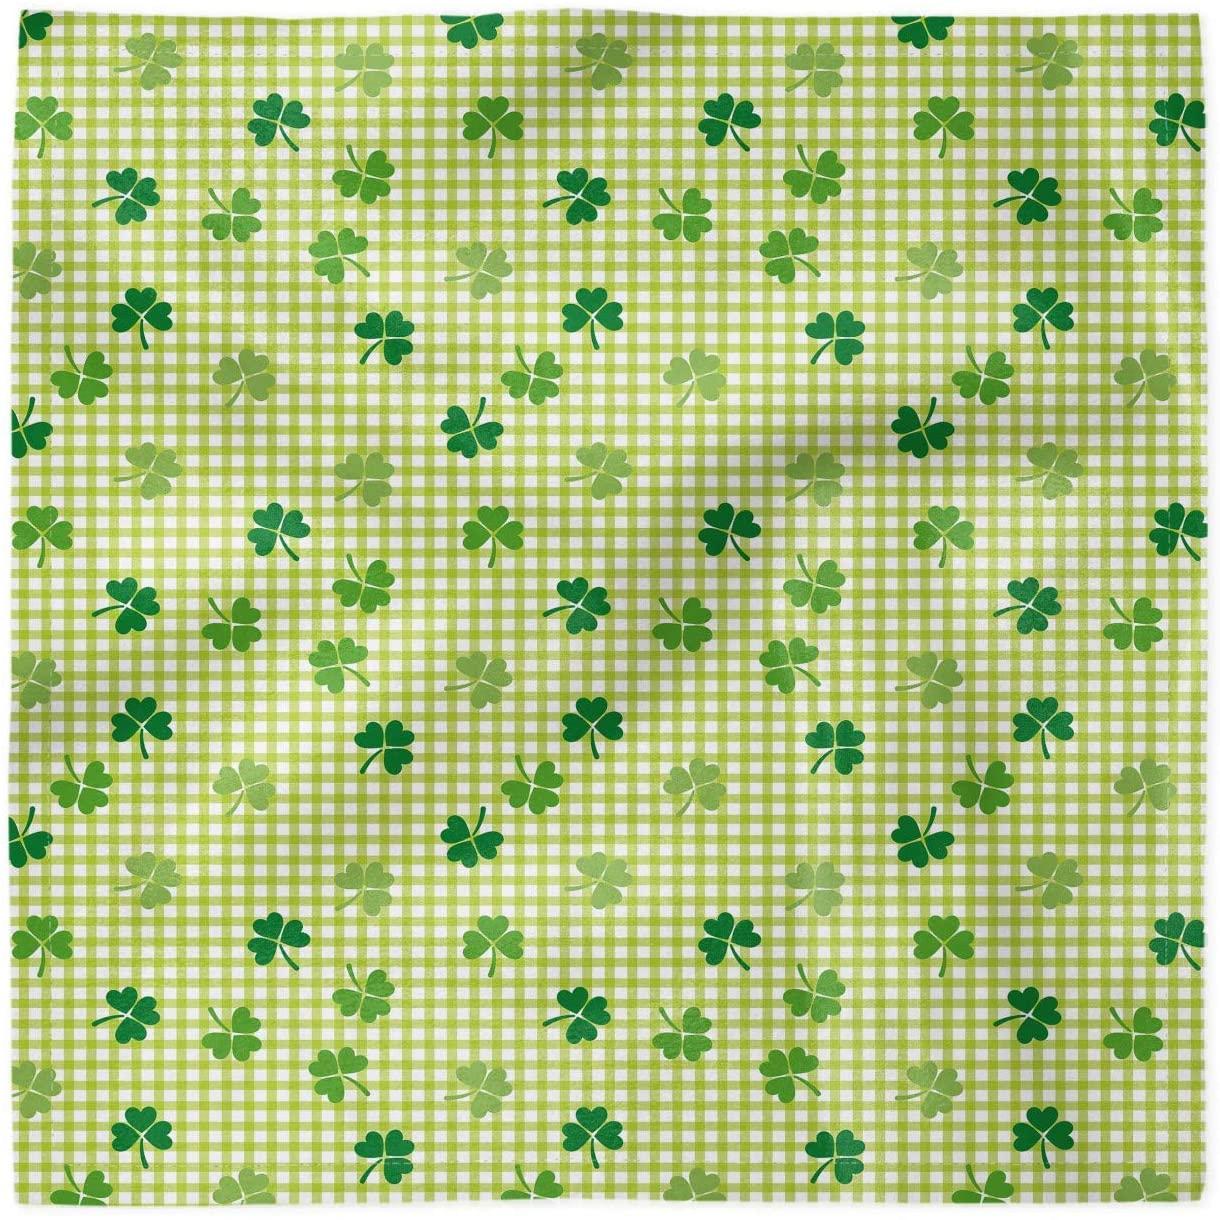 Ambesonne Irish Decorative Napkins Set of 4, Checkered Retro Shamrocks, Satin Fabric for Brunch Dinner Buffet Party, 12